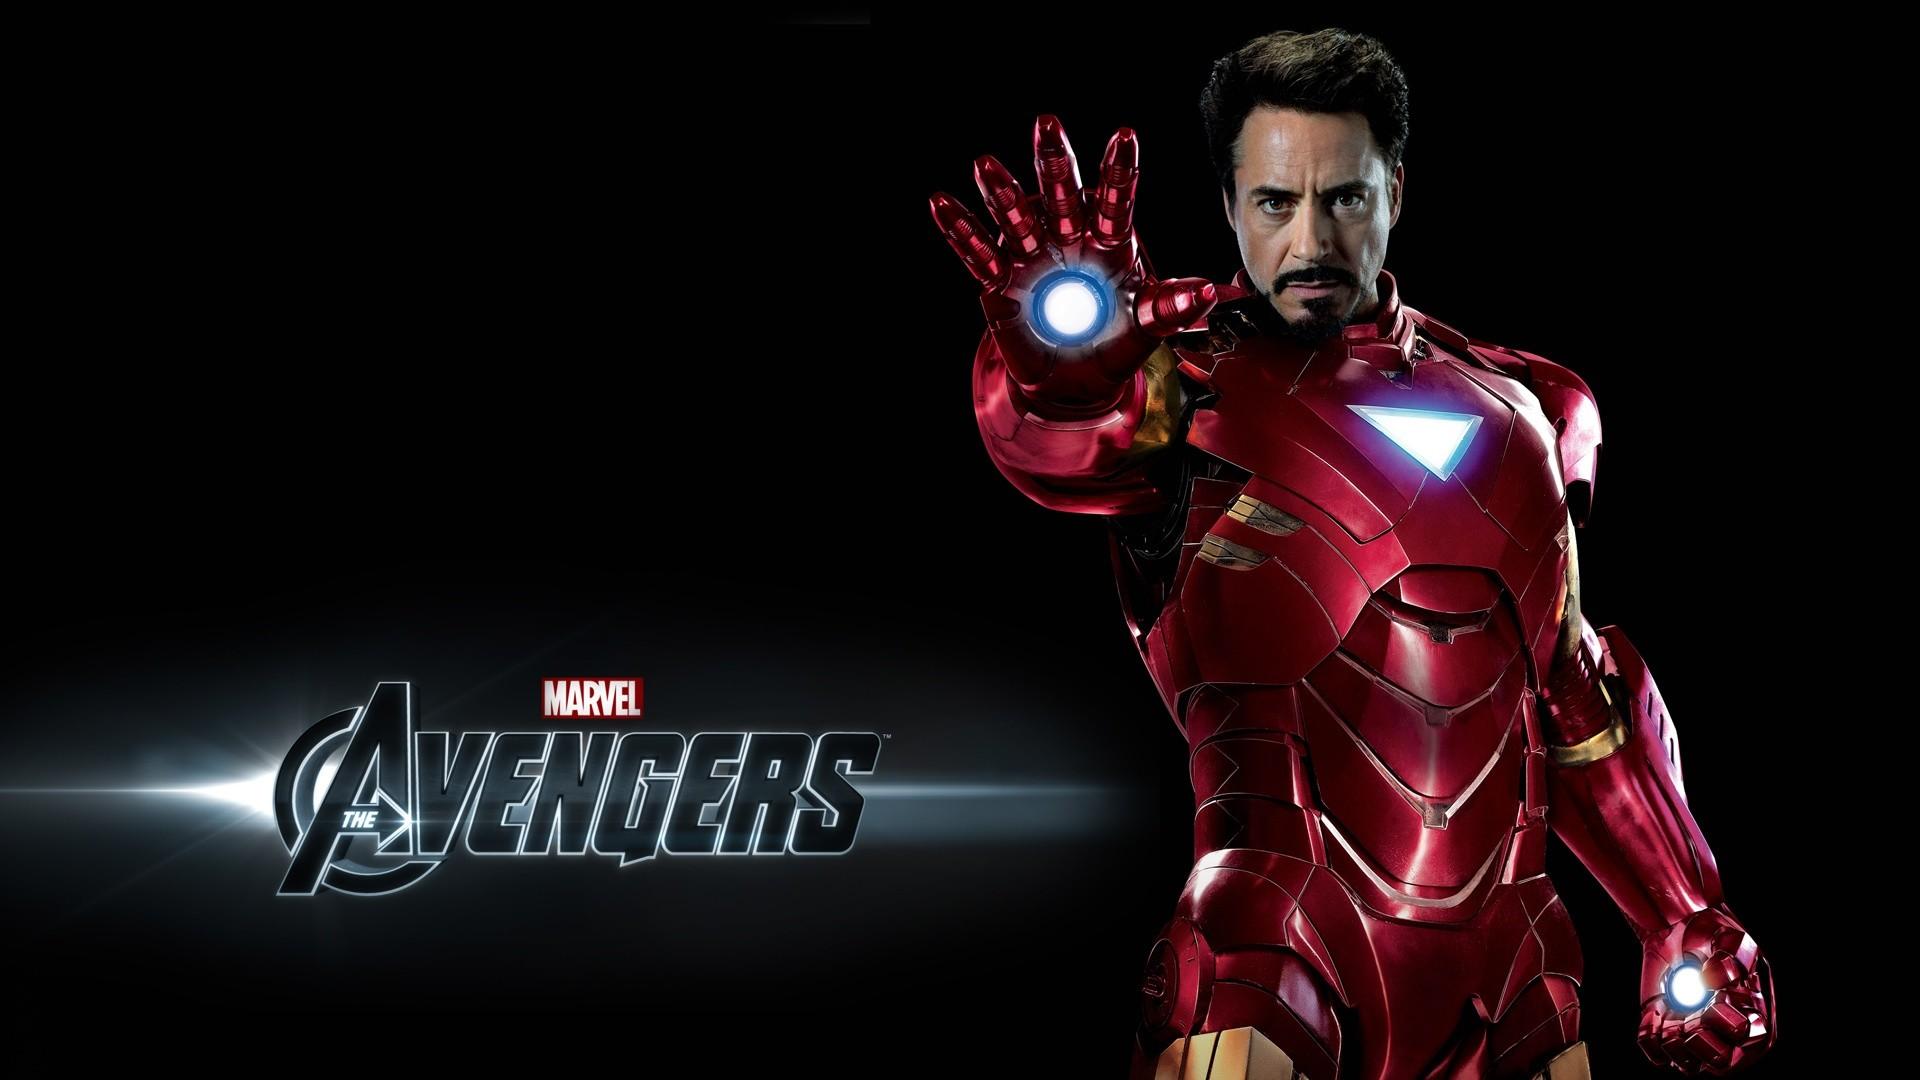 … 1080p Avengers Wallpapers HD Pixels Talk